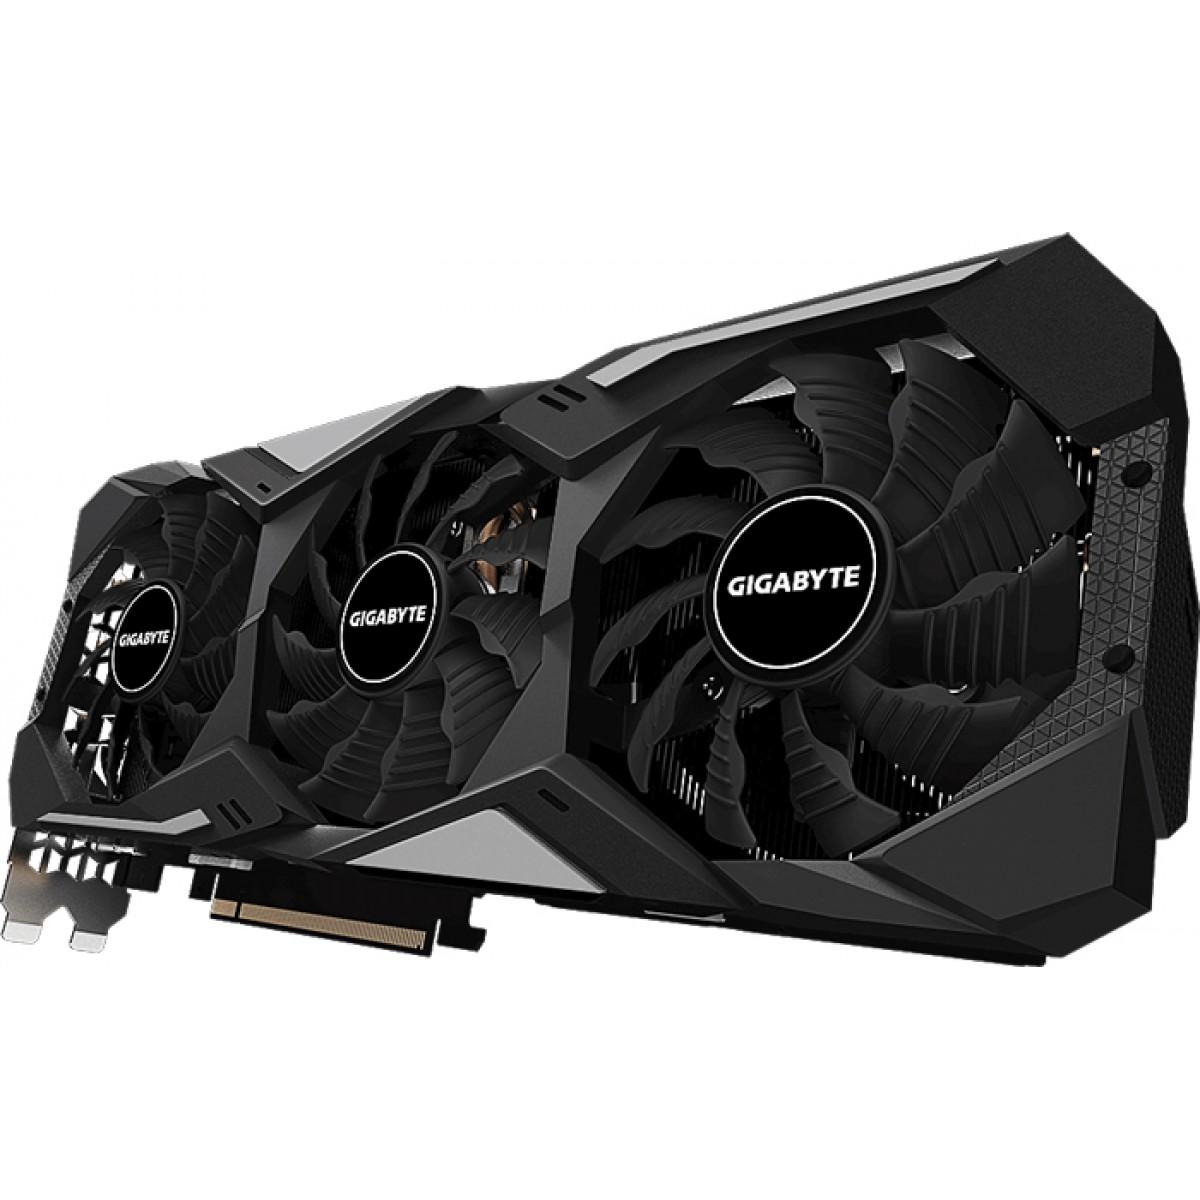 Placa de Vídeo Gigabyte, GeForce, RTX 2080 Super Gaming OC, 8GB, GDDR6, 256Bit, GV-N208SGAMING OC-8G